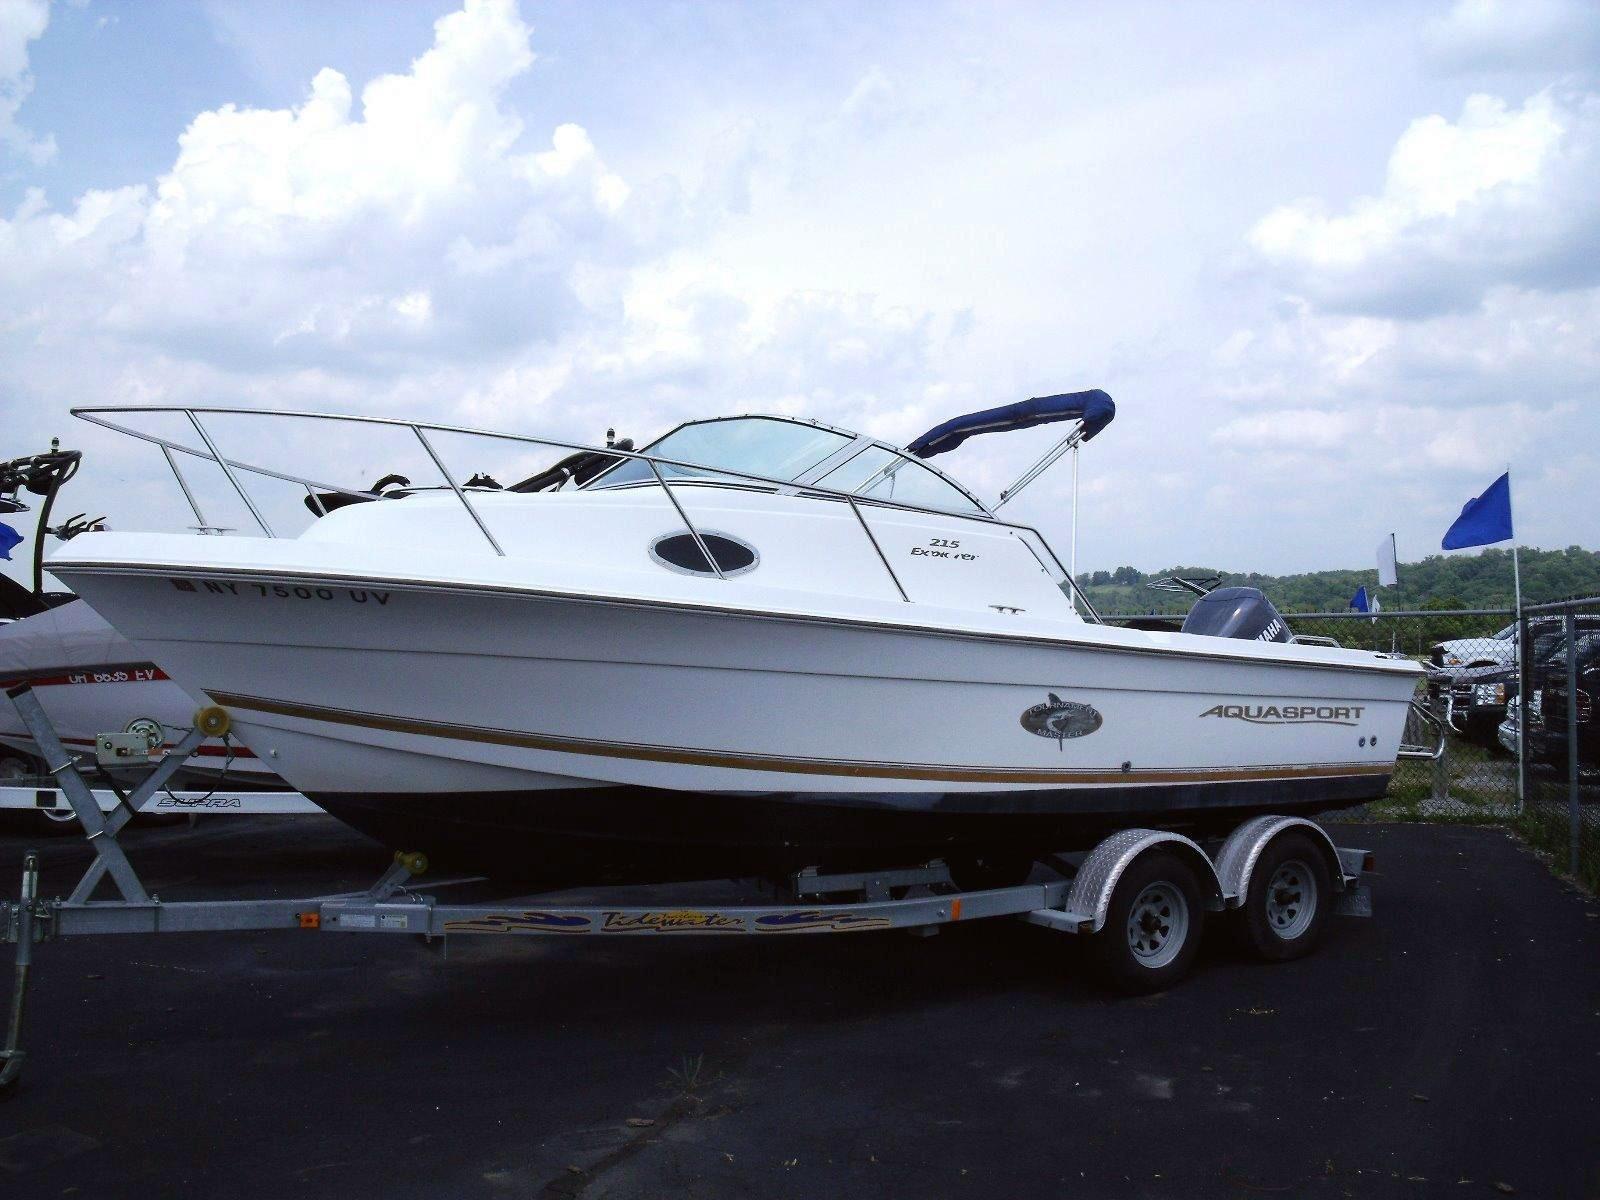 2000 used aquasport 215 explorer saltwater fishing boat for Saltwater fishing boats for sale